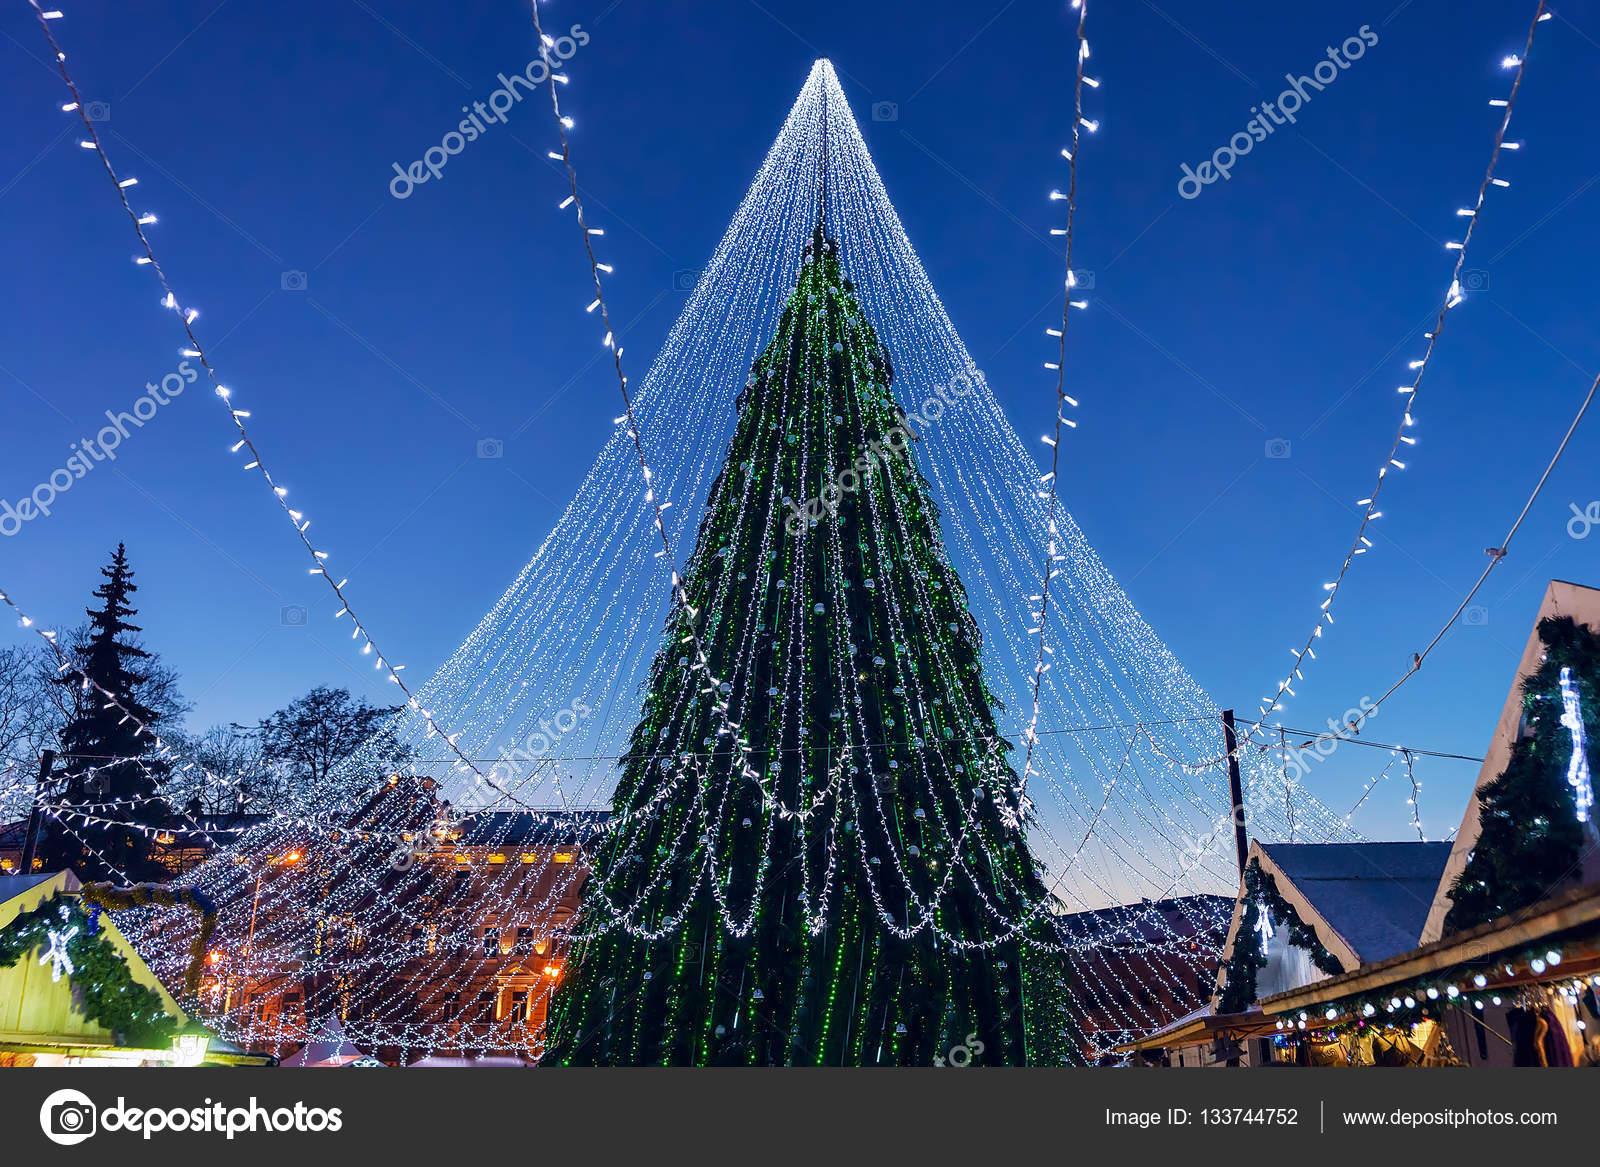 45d0c09e726 Λαμπερό χριστουγεννιάτικο δέντρο με τις διακοσμήσεις που είναι  εγκατεστημένα στο Βίλνιους Λιθουανίας — Φωτογραφία Αρχείου